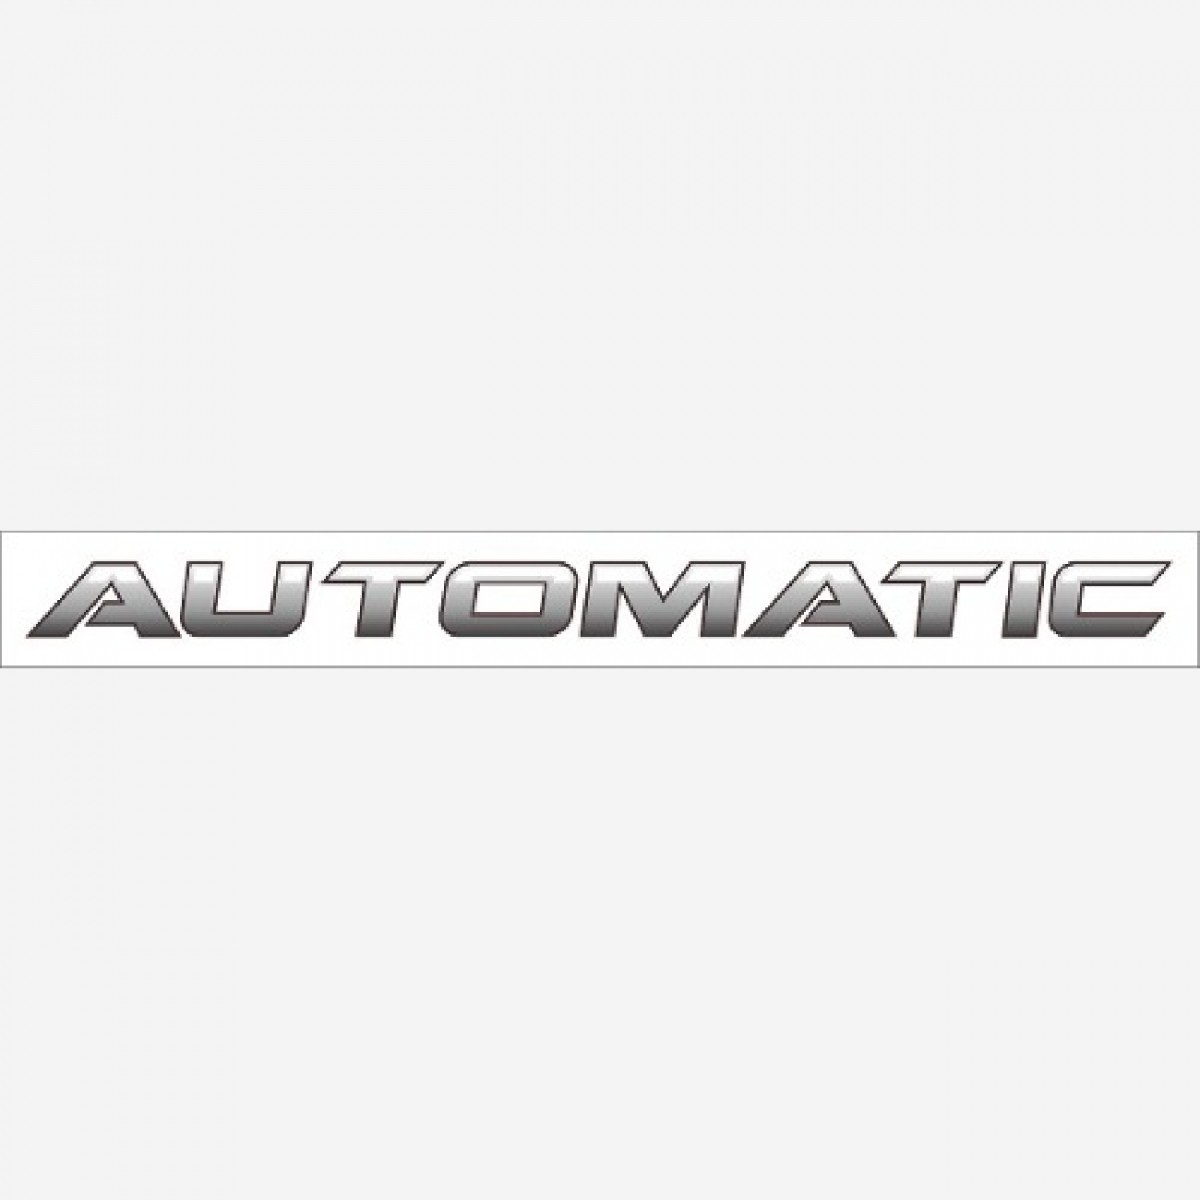 Emblema Adesivo Automatic Toyota Hilux Srv Decalx